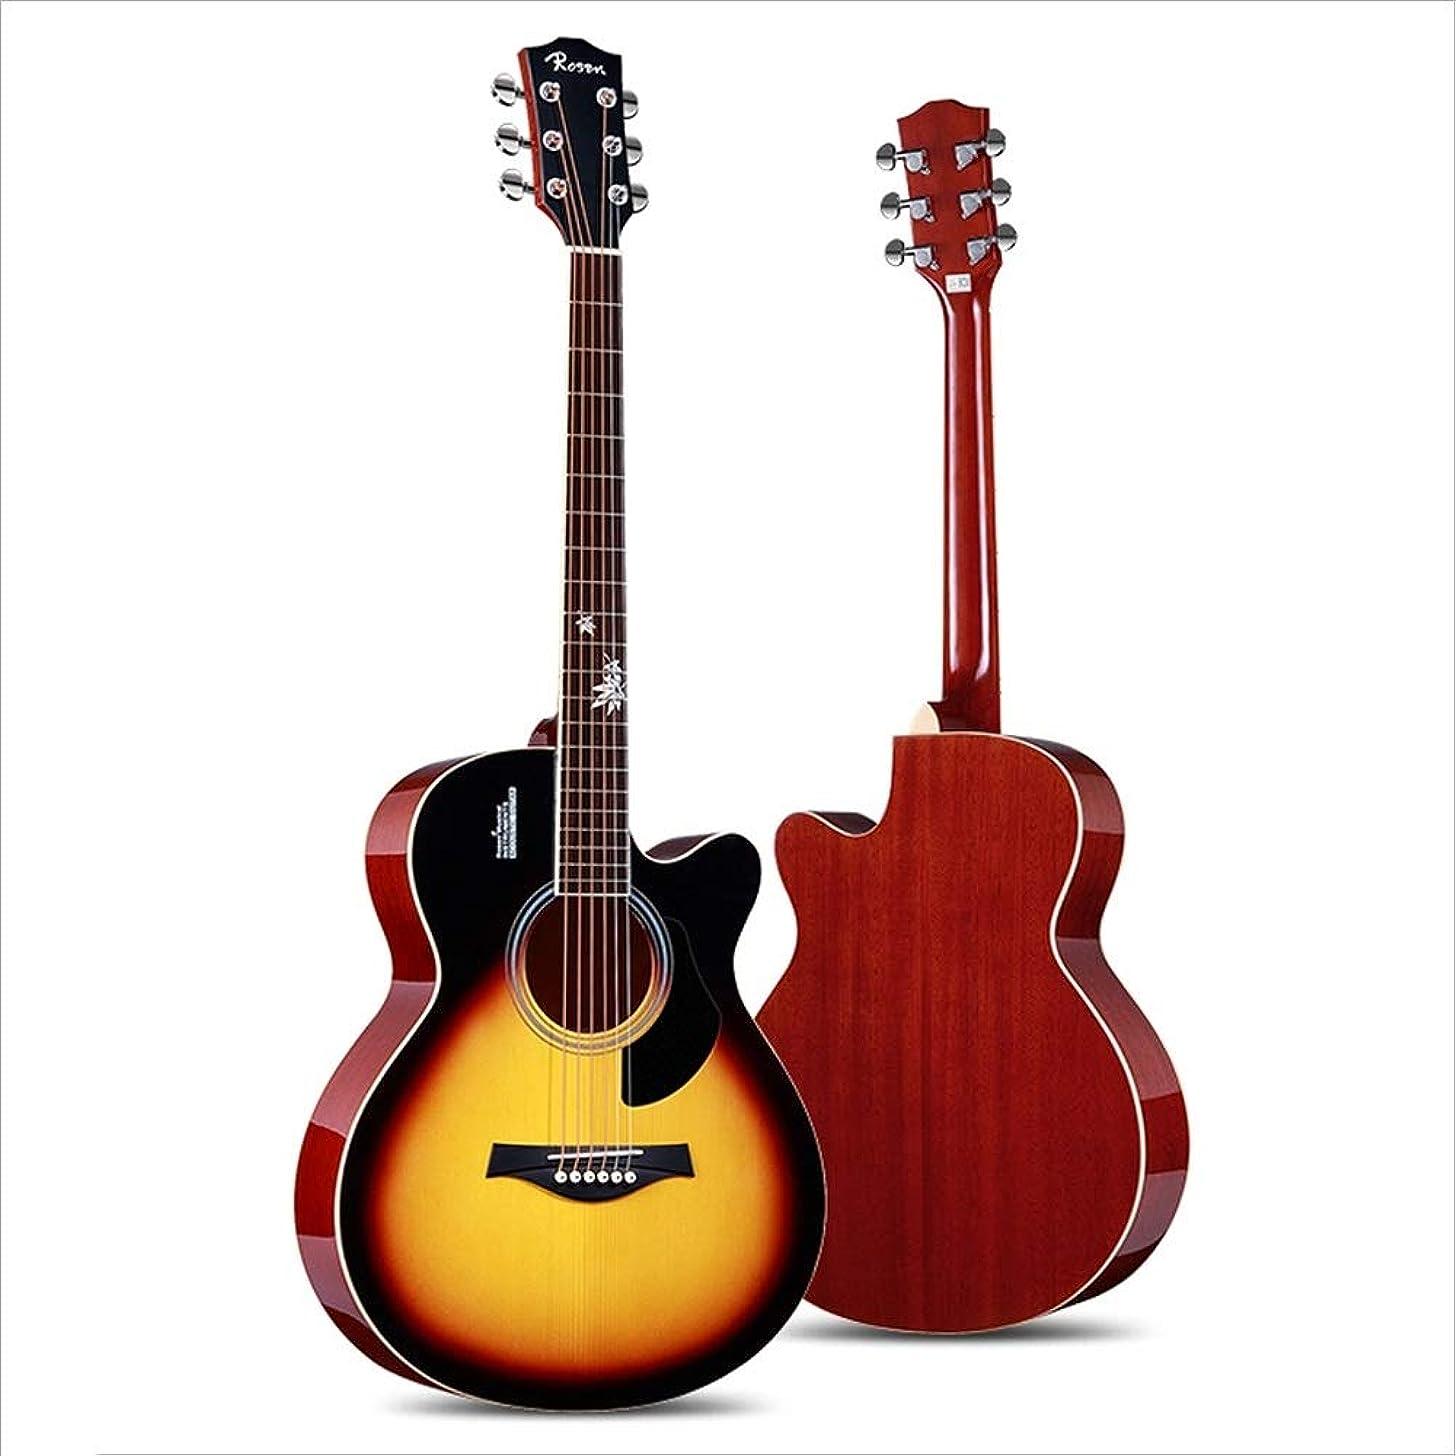 Aigliady 41 Inch Beginner Student Men And Women Veneer Ballad Acoustic Guitar Minimalist Fashion Inlaid Maple Leaf Guitar With Stringed Instrument Tuner Capo Polishing Cloth